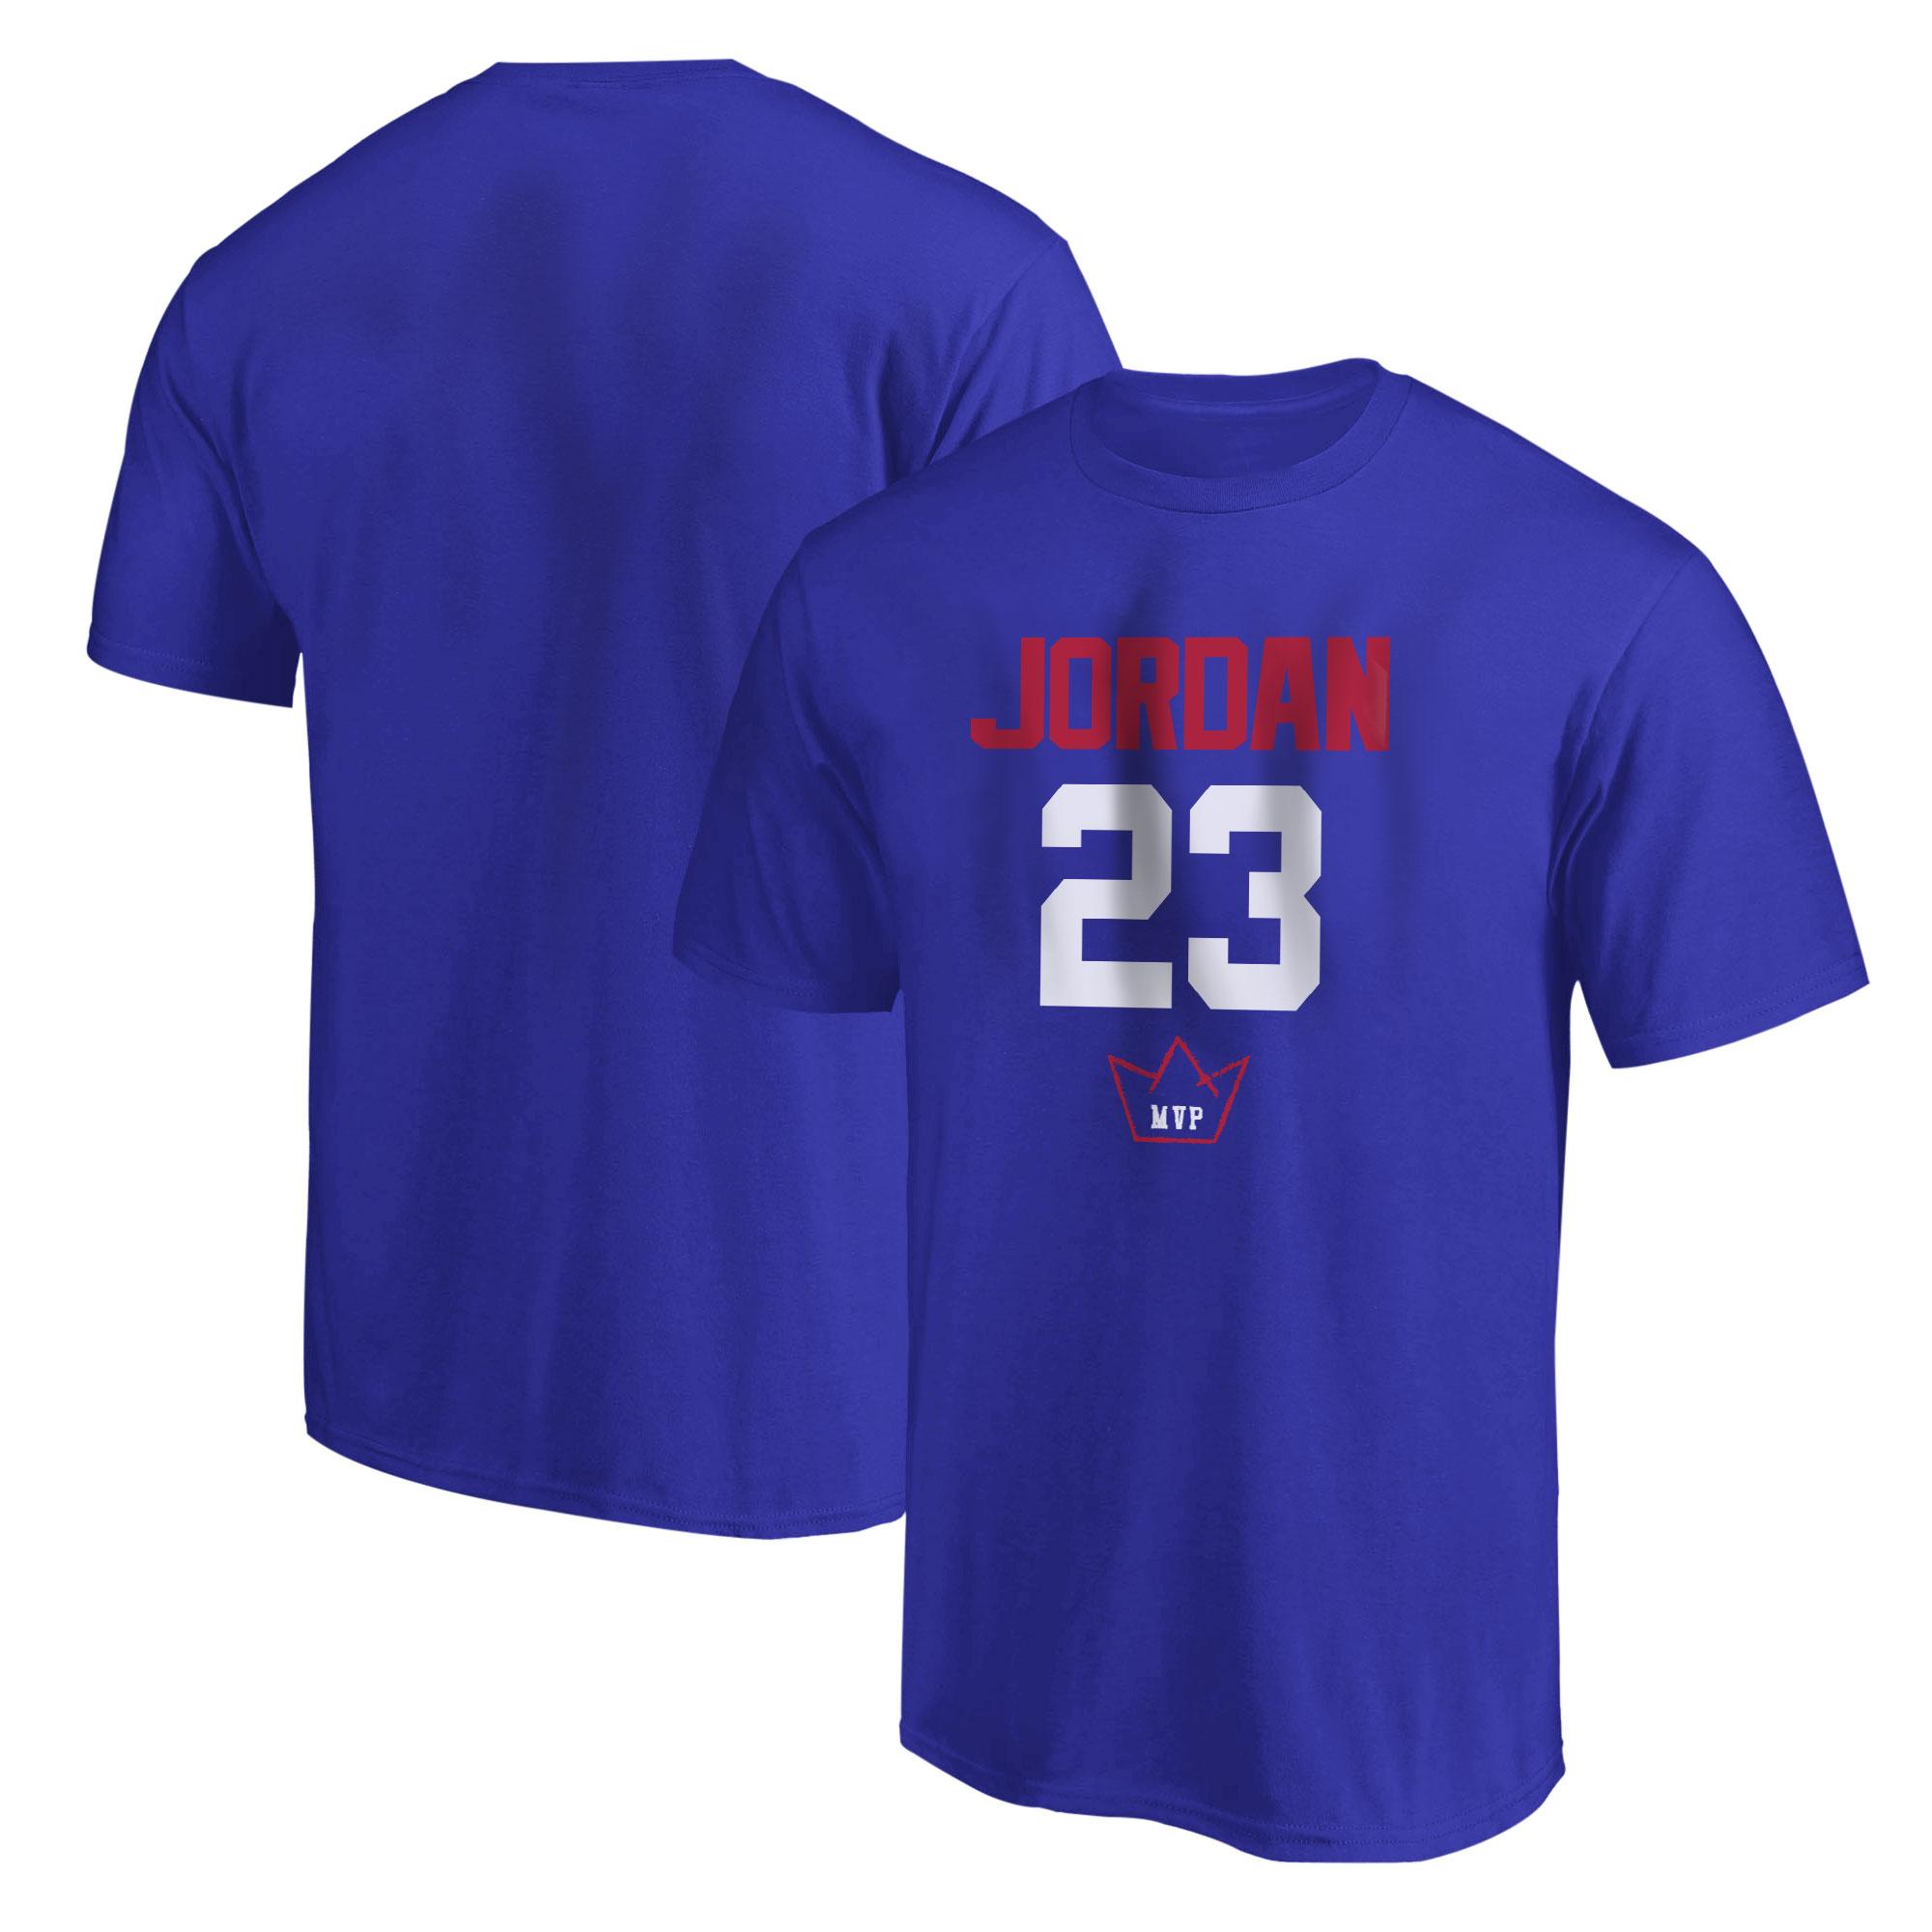 Michael Jordan Tshirt (TSH-BLU-494-PLYR-JRDN-23)